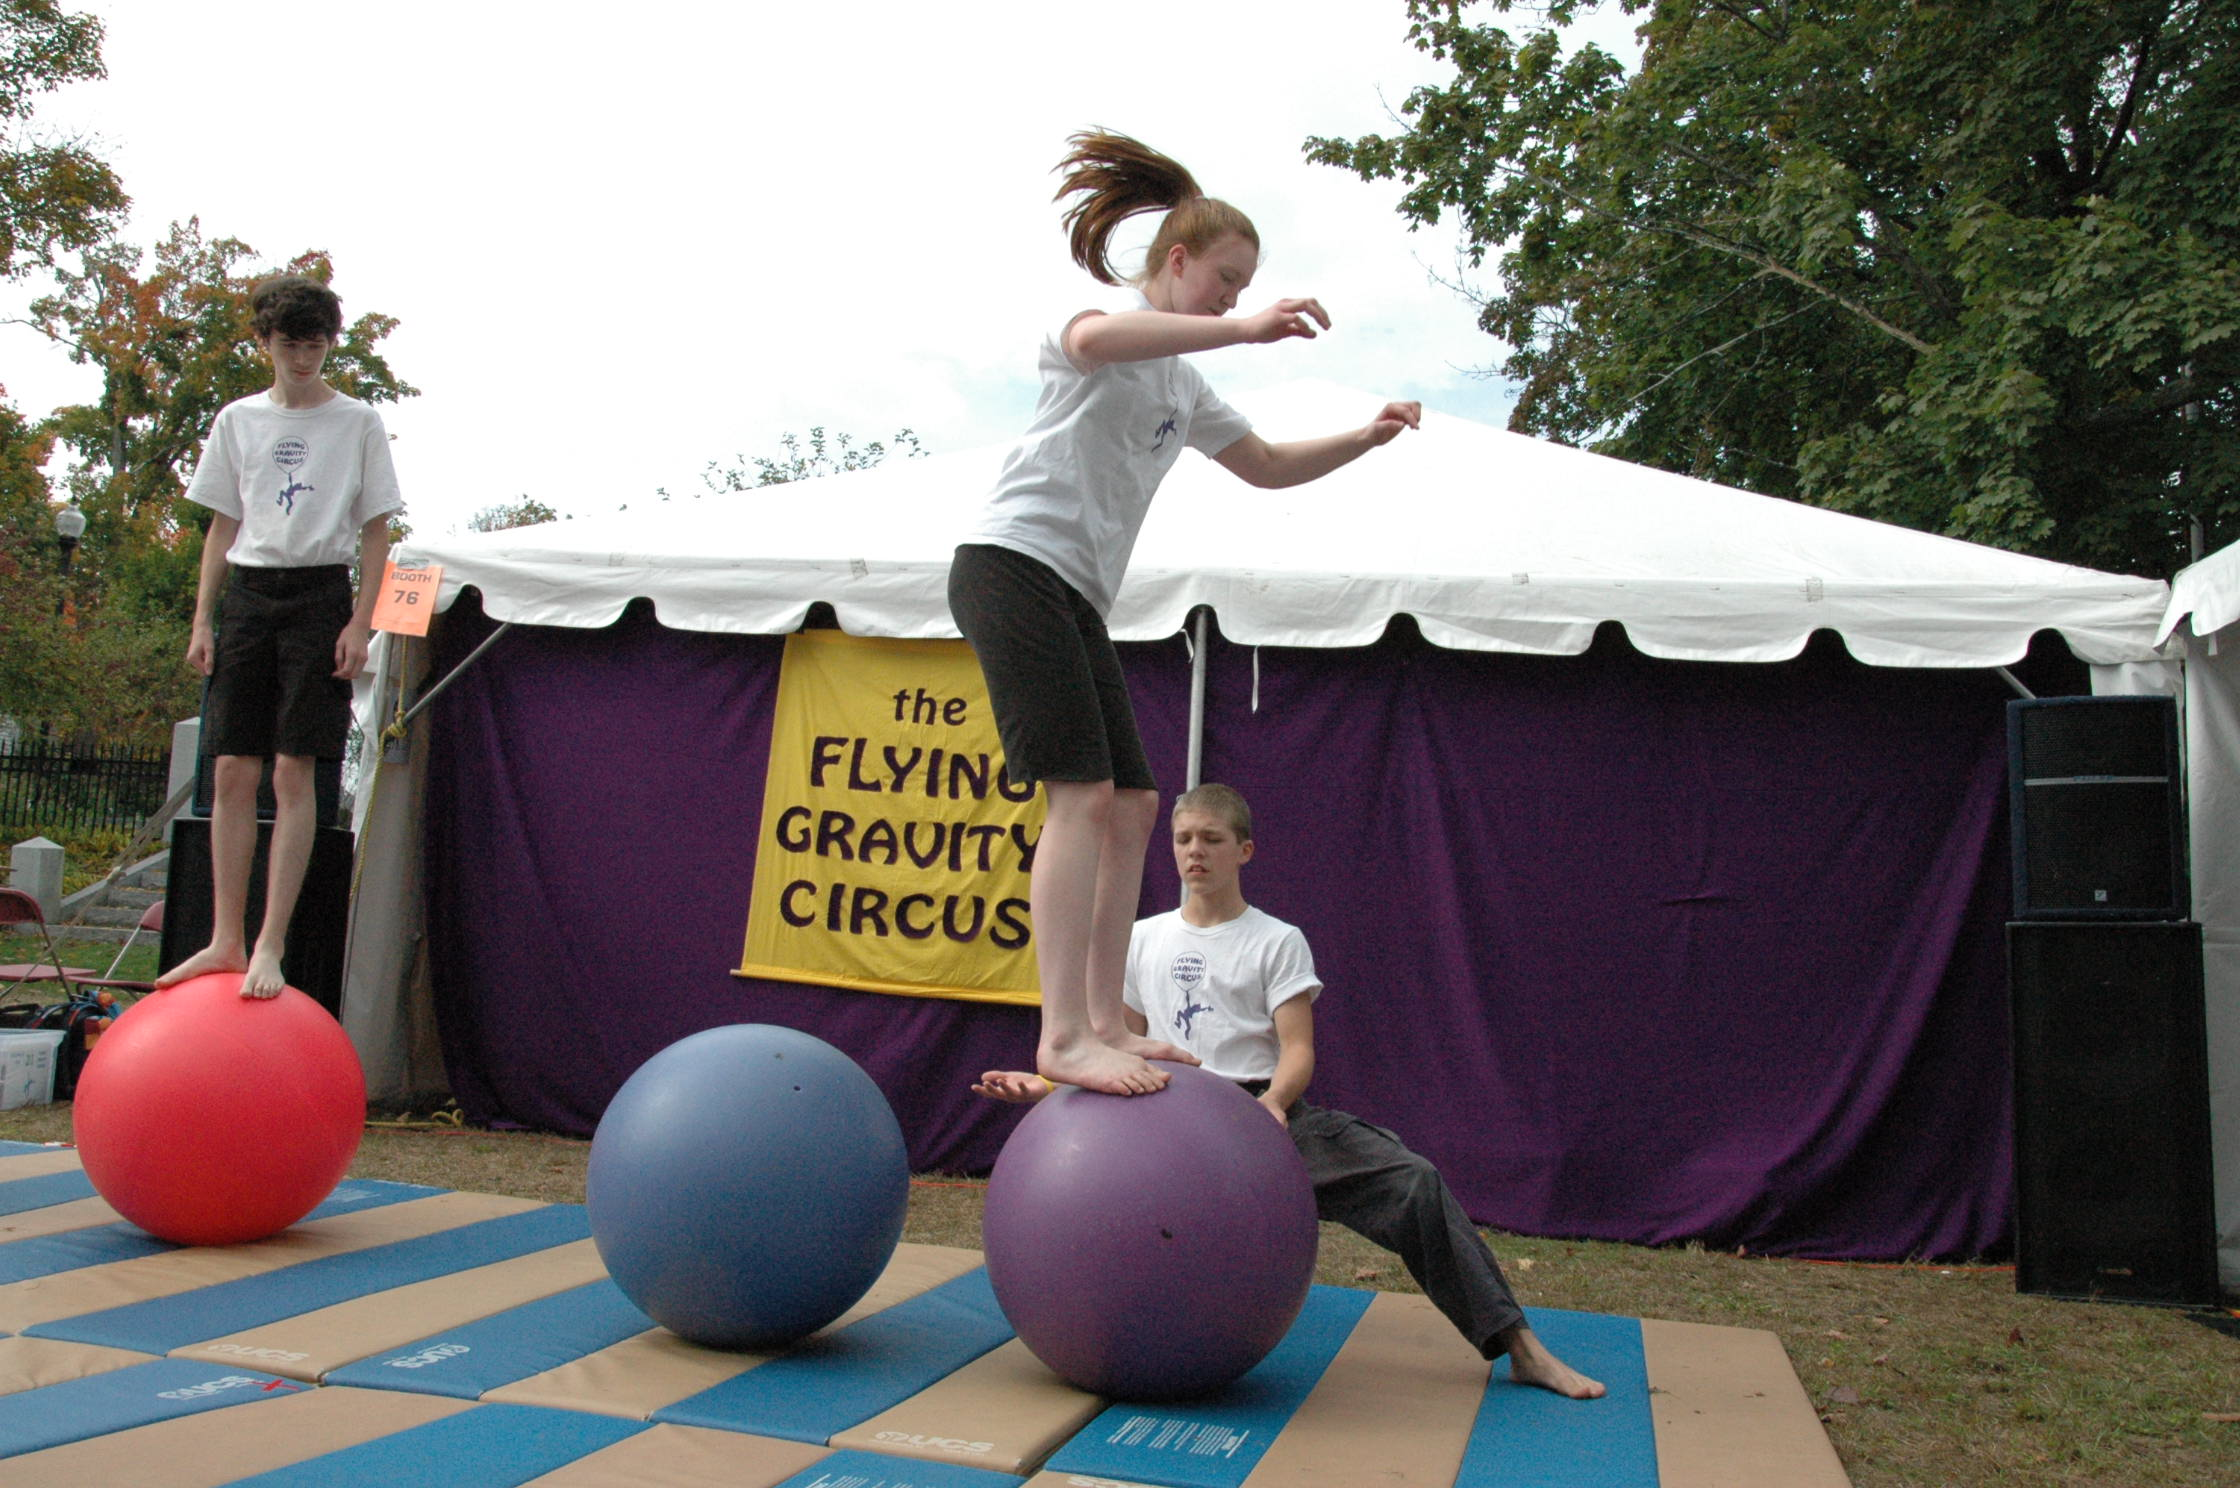 2012-10-06 Flyin Gravity Circus - Pumpkin 080.JPG